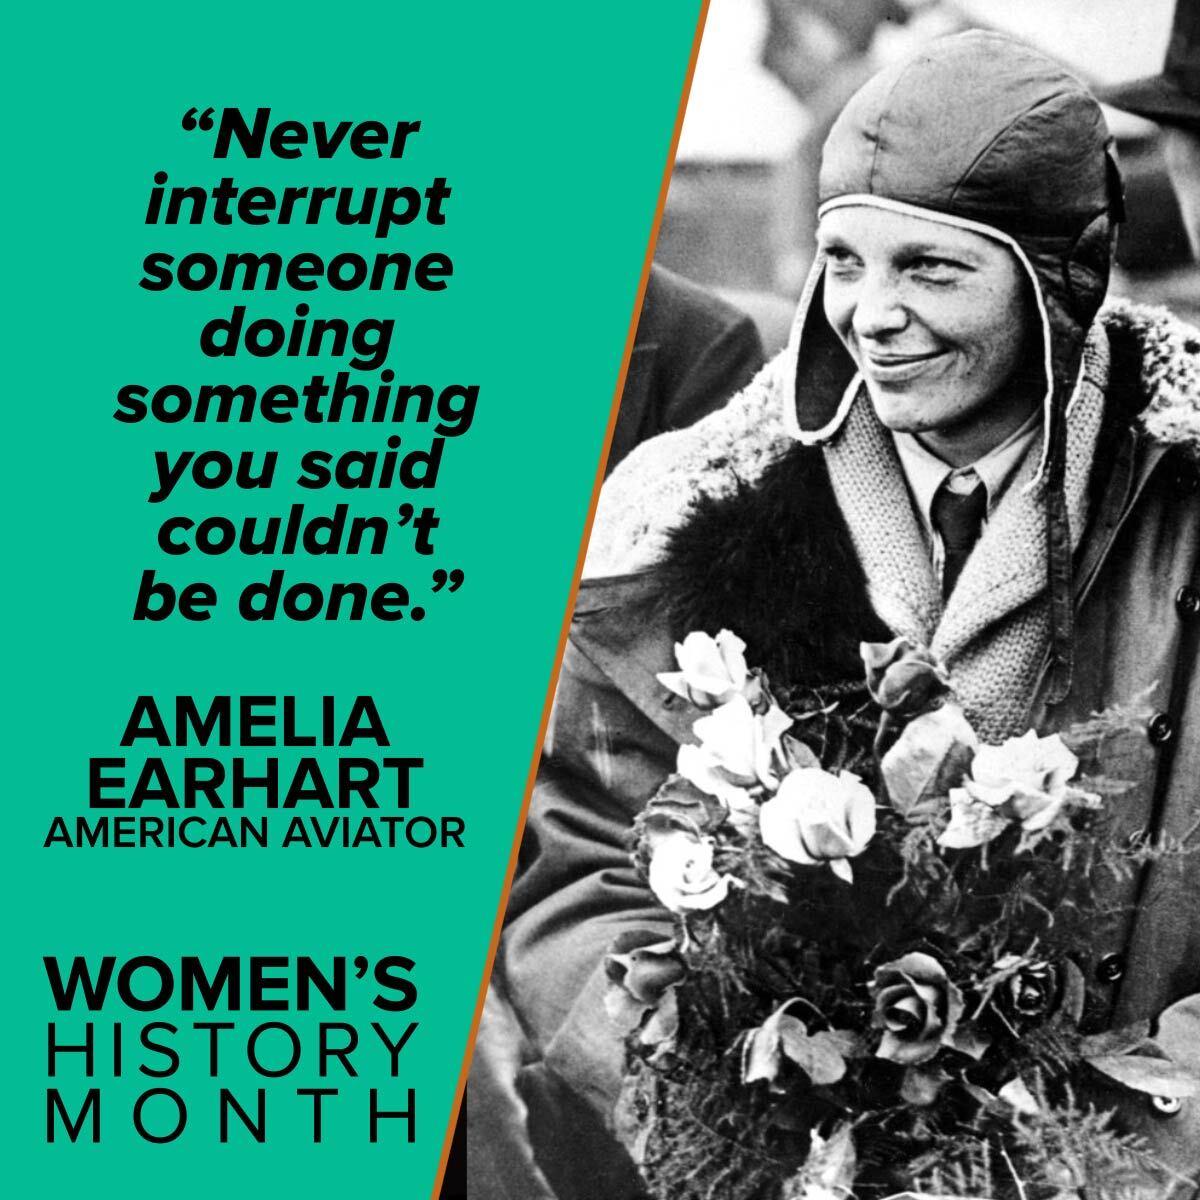 Women's History Month_Amelia Earhart.jpg